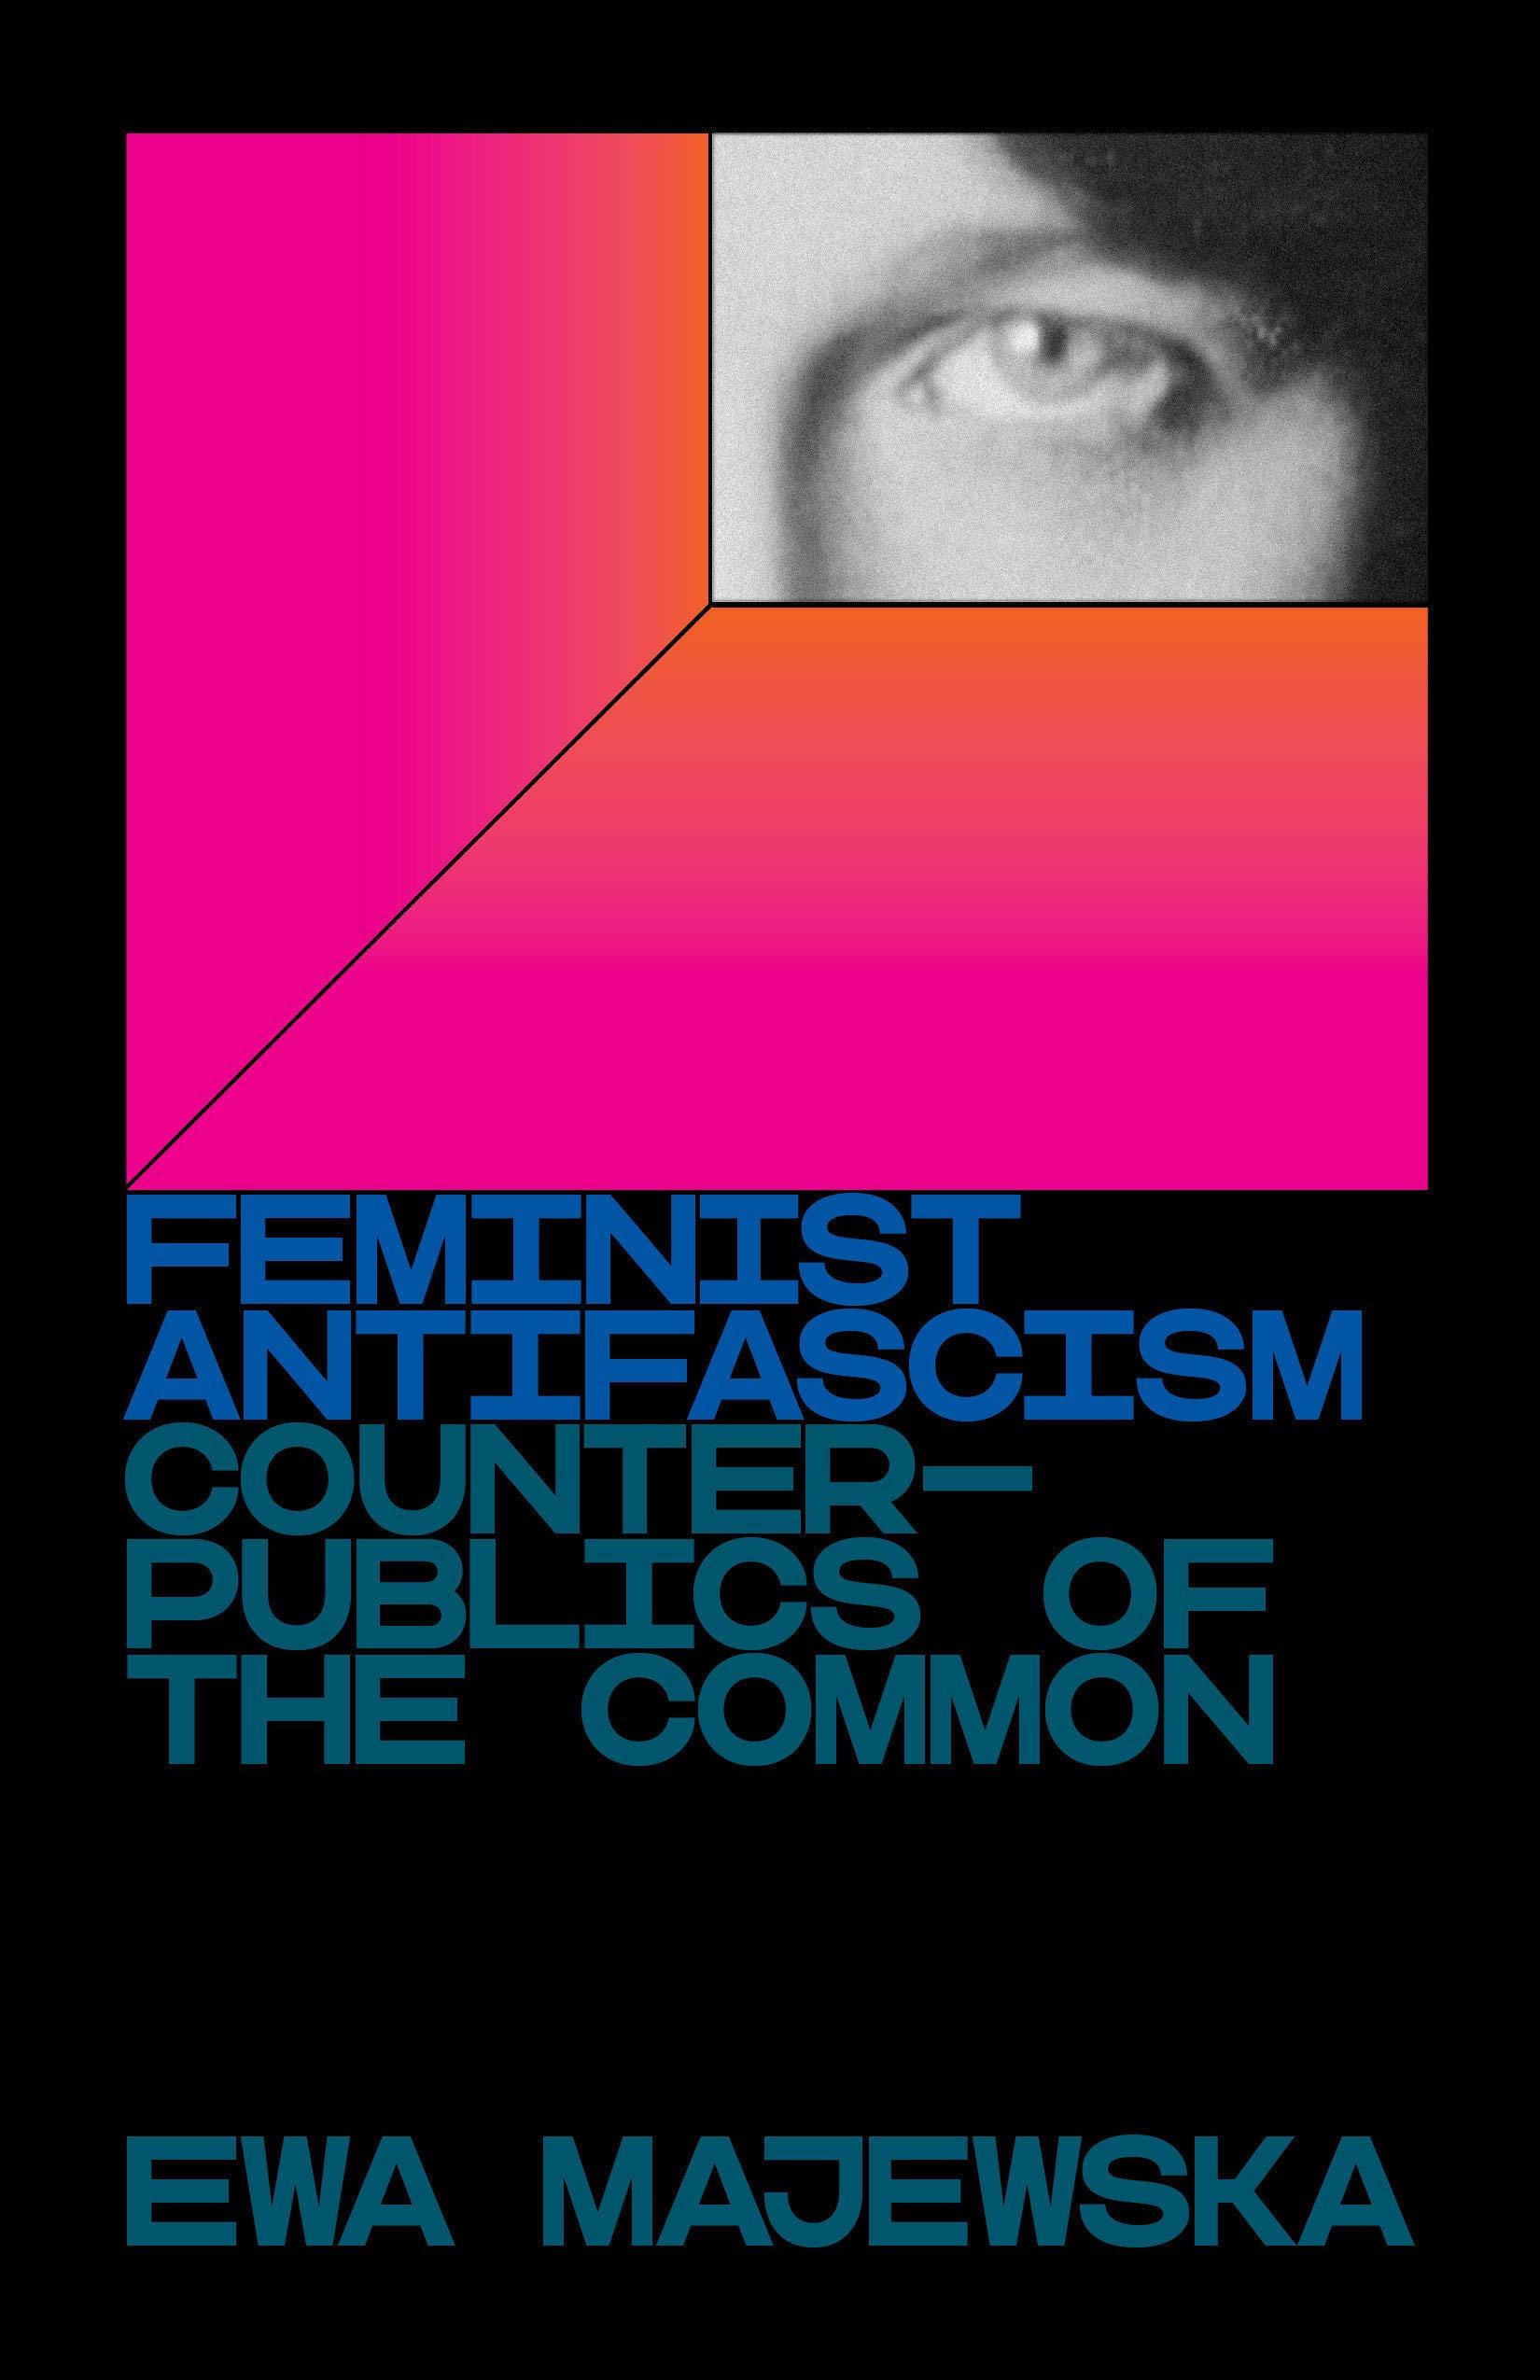 Ewa Majewska, Feminist Antifascism: Counterpublics of the Common